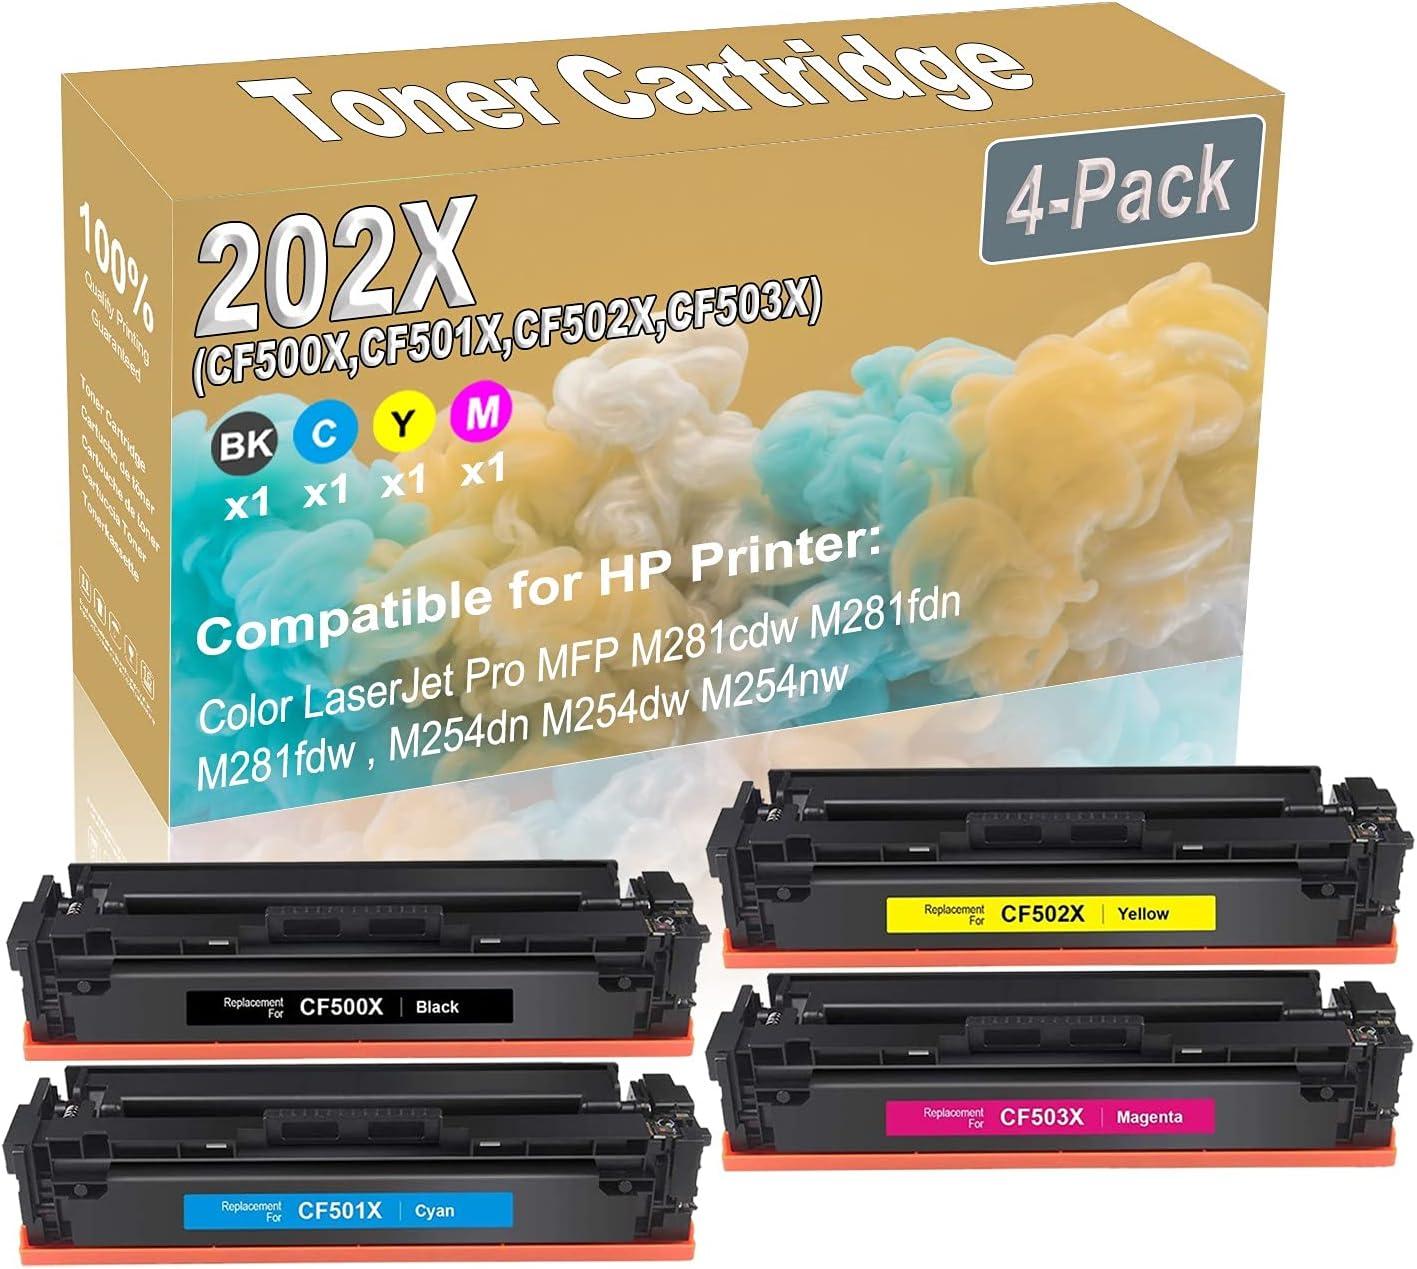 4-Pack (BK+C+Y+M) Compatible M452dn M452dw M452nw MFP M280nw MFP M281fdn Laser Toner Cartridge (High Capacity) Replacement for HP 202X (CF500X CF501X CF502X CF503X) Printer Toner Cartridge